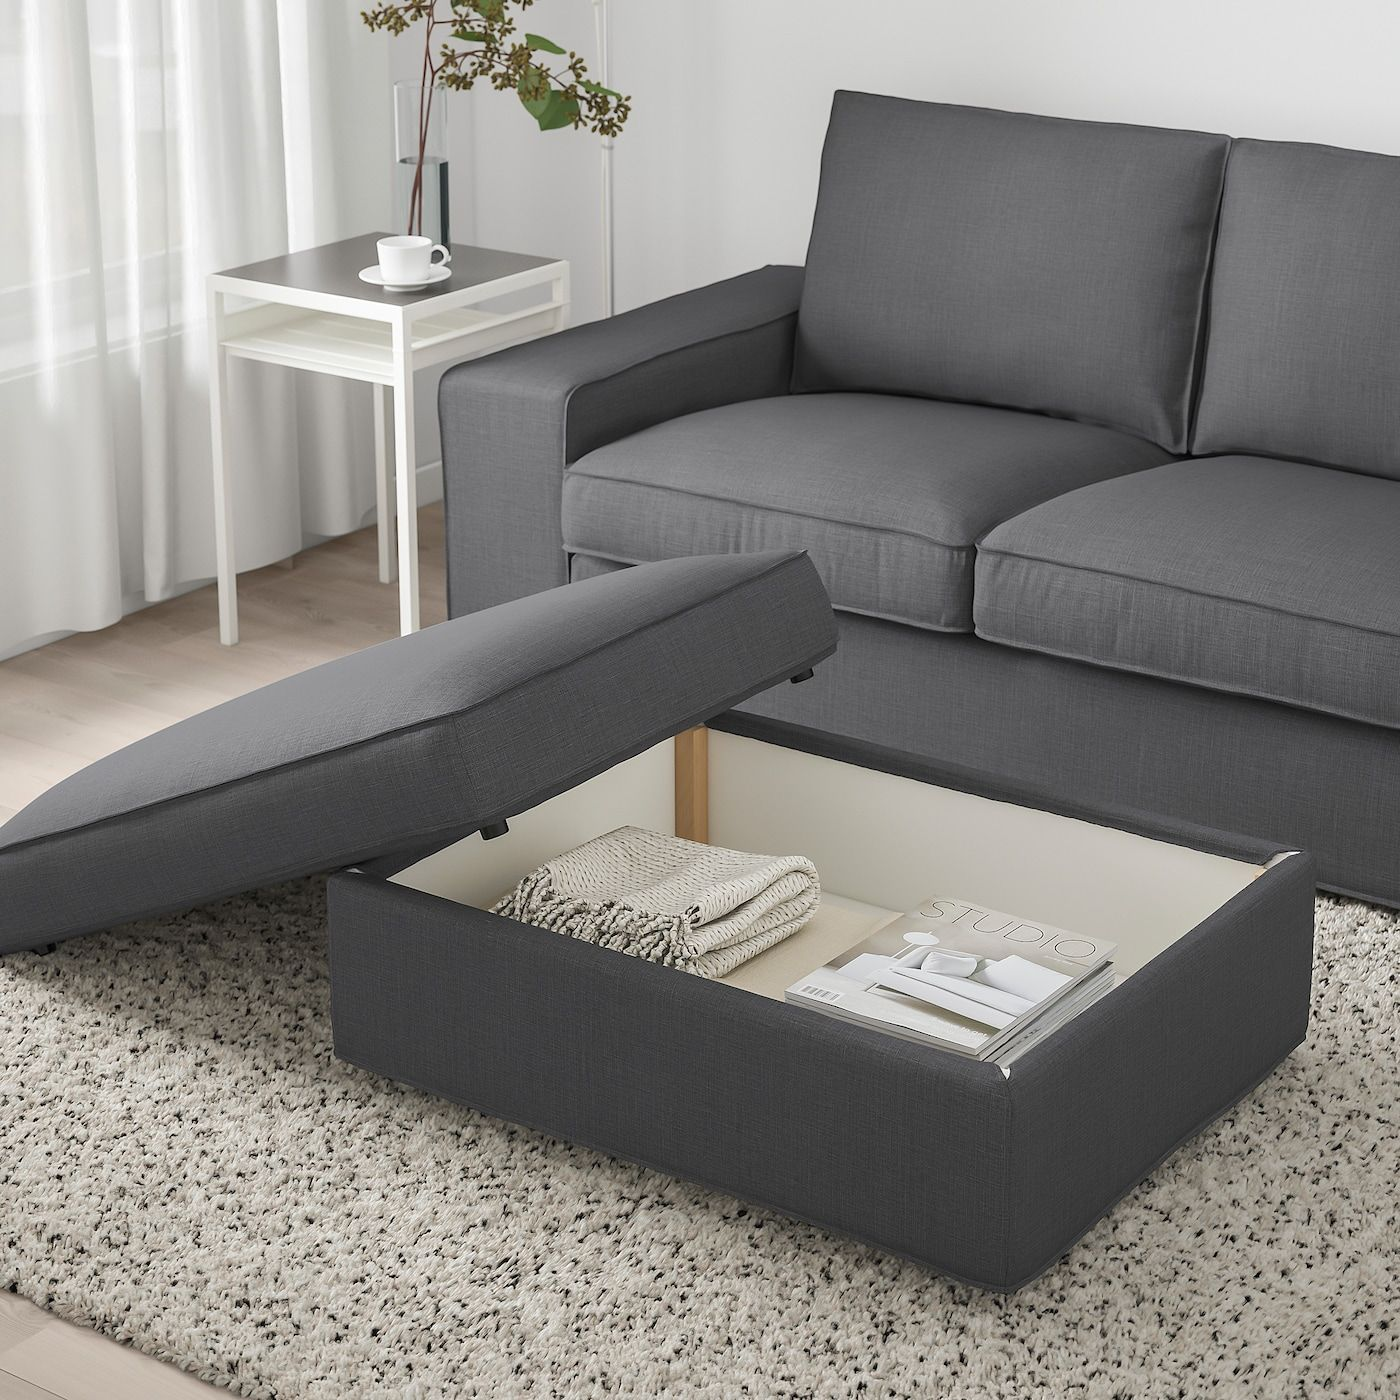 Ikea Kivik Skiftebo Dark Gray Ottoman With Storage In 2020